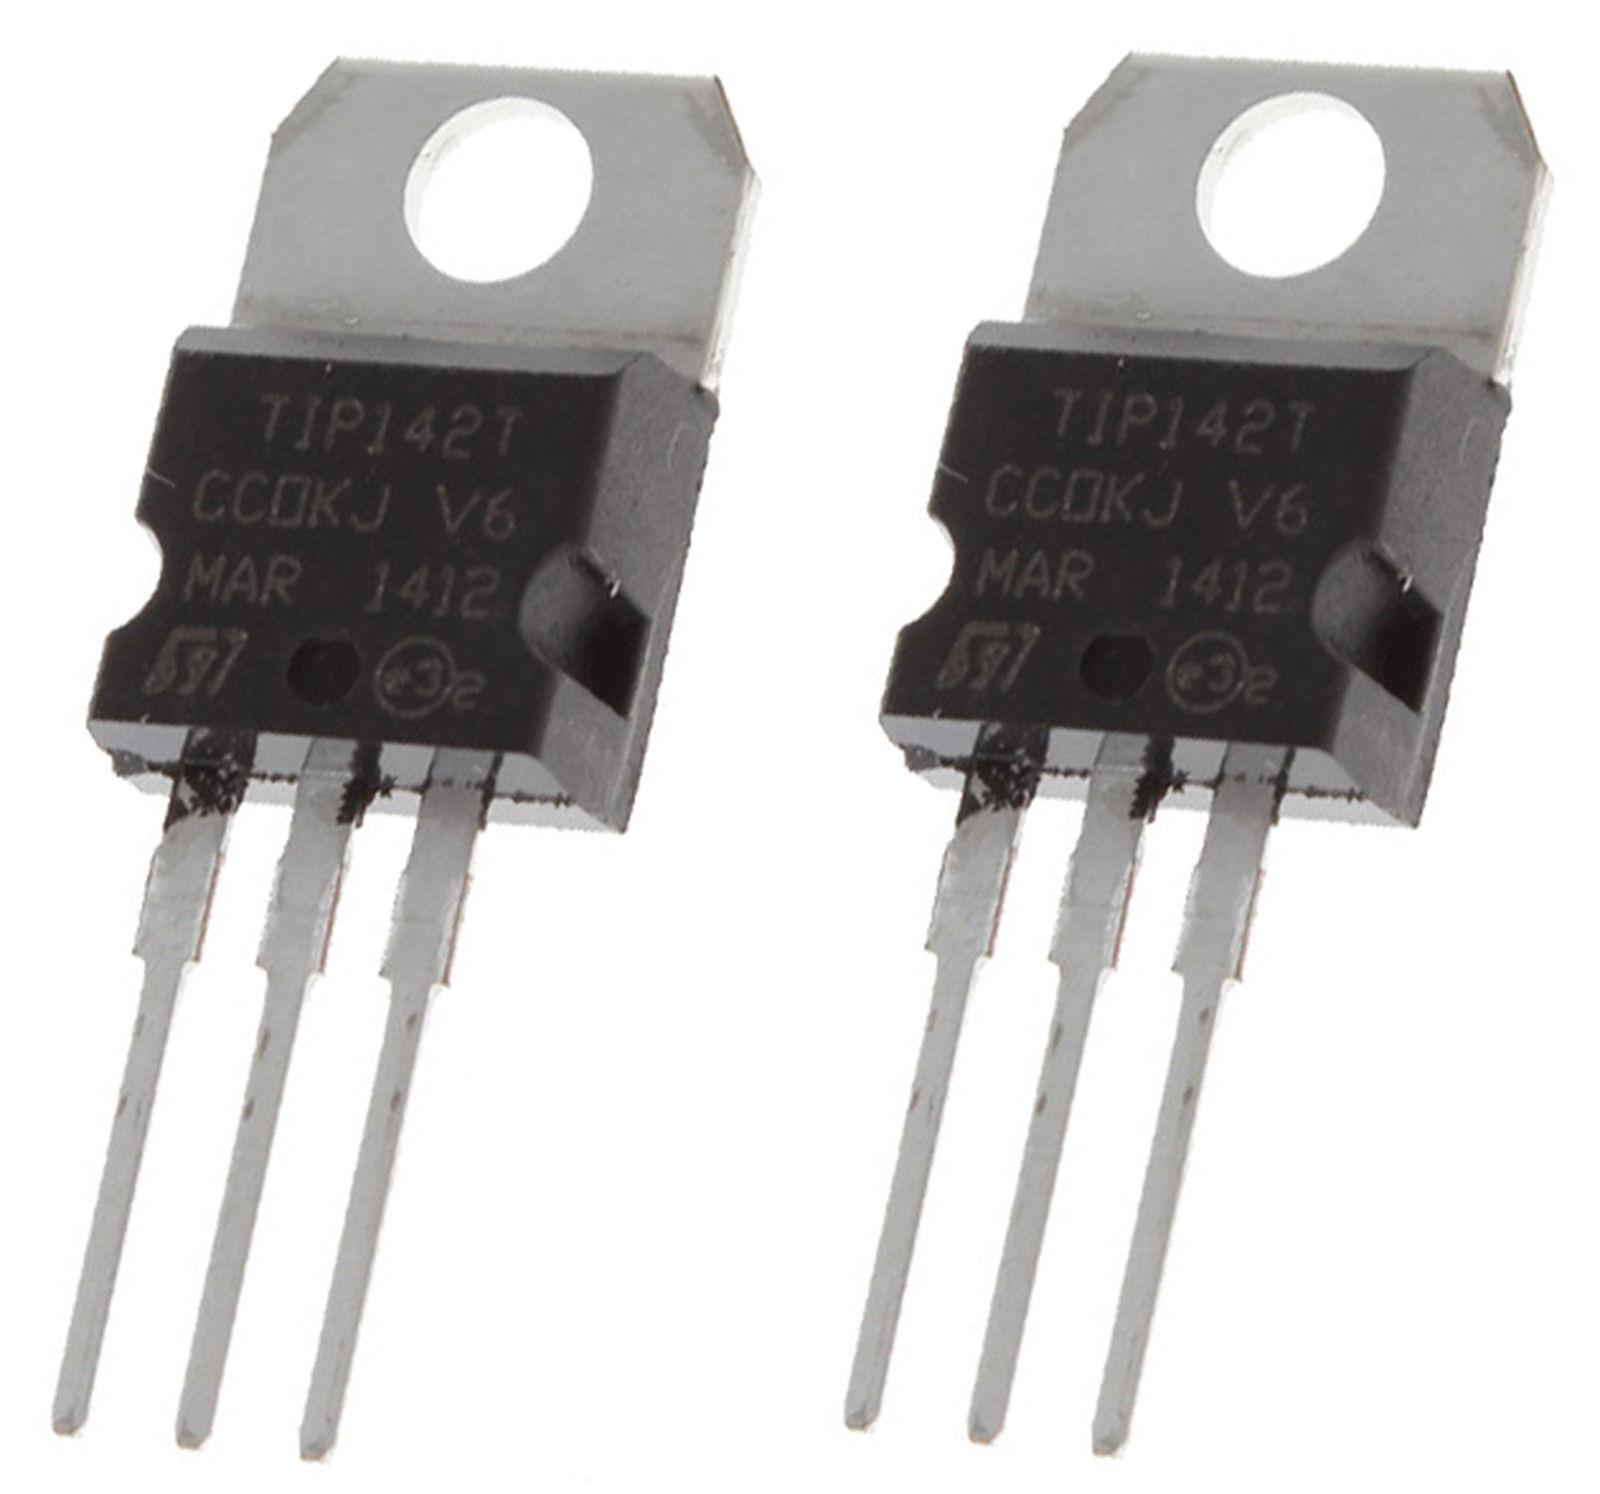 2 X Tip142t Npn Epitaxial Planar Silicon Darlington Transistor To Configuration